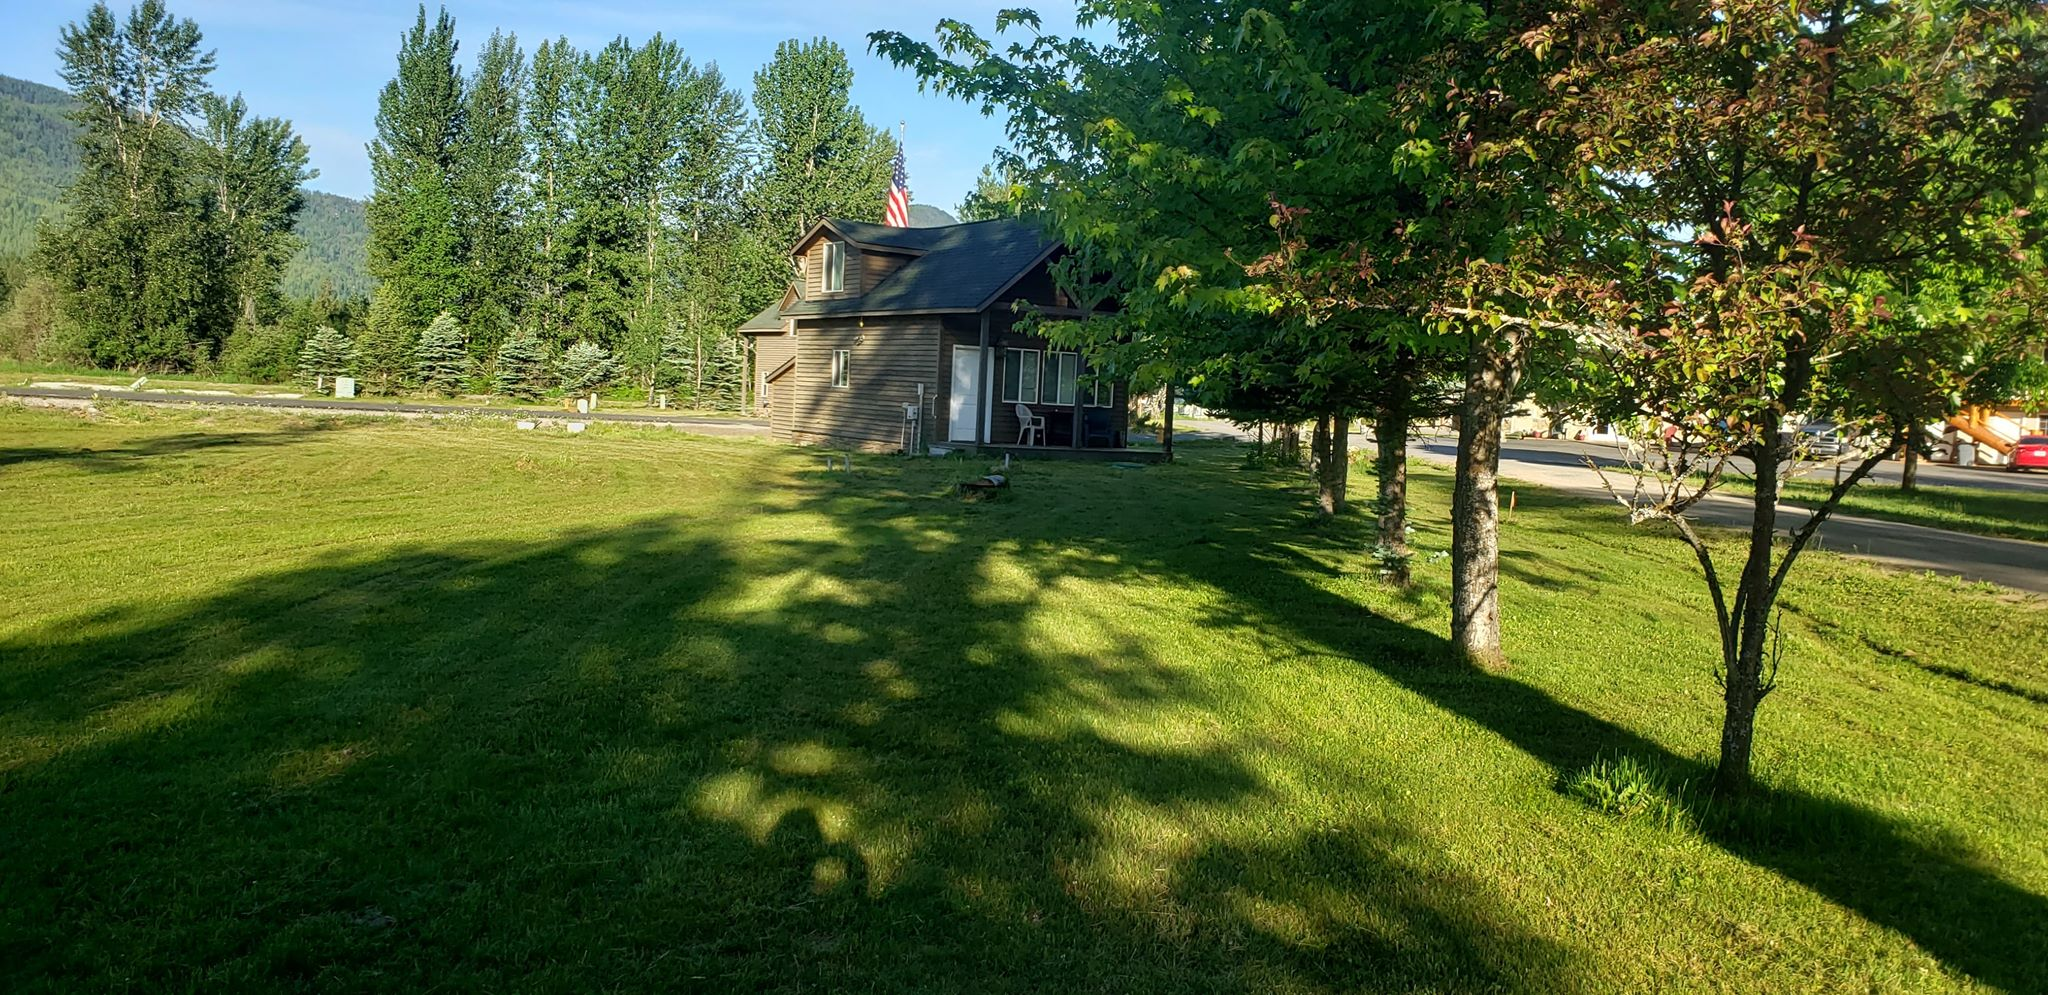 Cabin 1 lawn 2